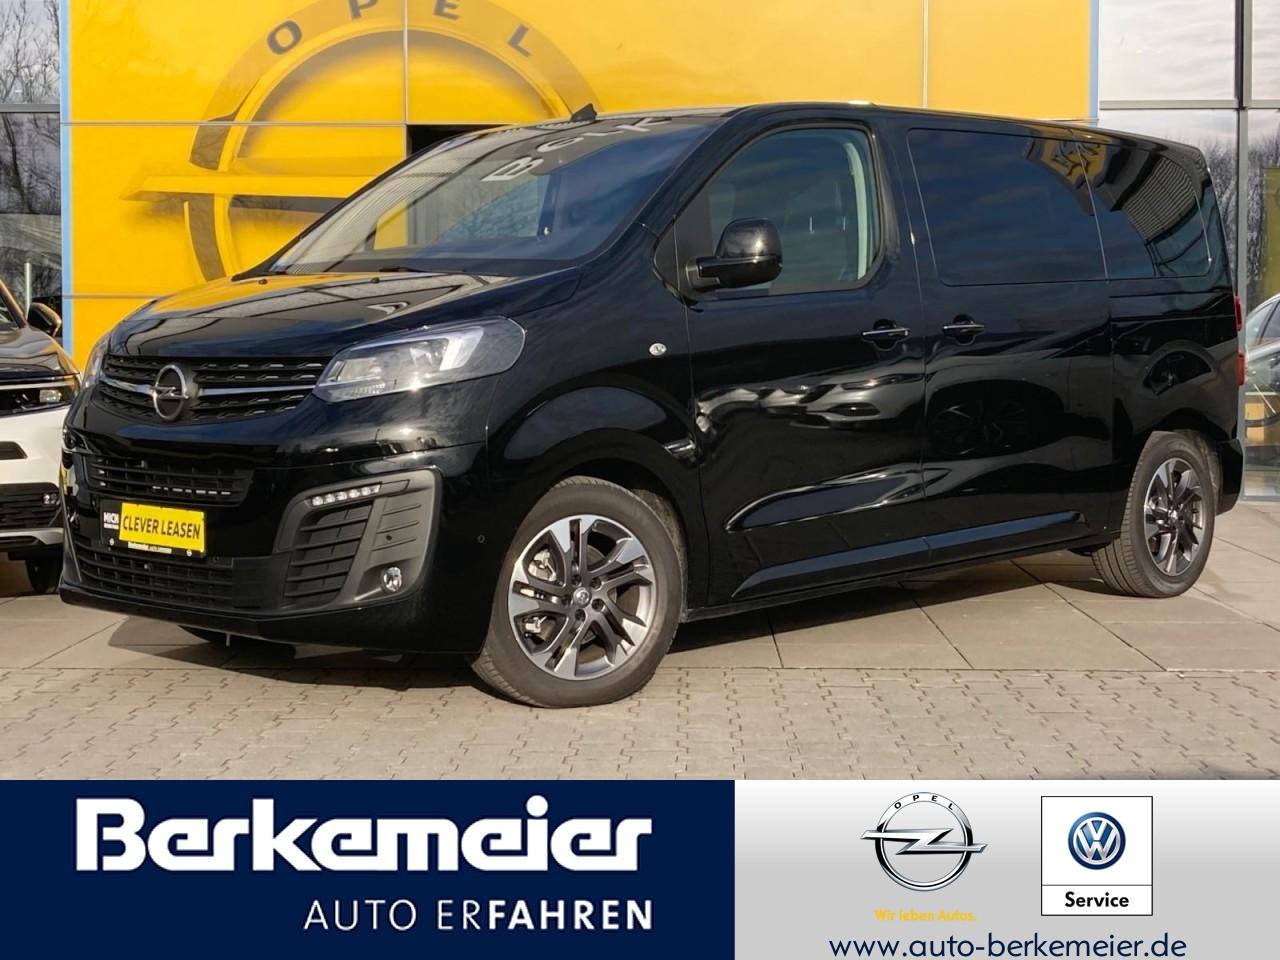 Opel Zafira Life Elegance M 2.0 AT *Leder/Navi/7-Sitzer*, Jahr 2021, Diesel